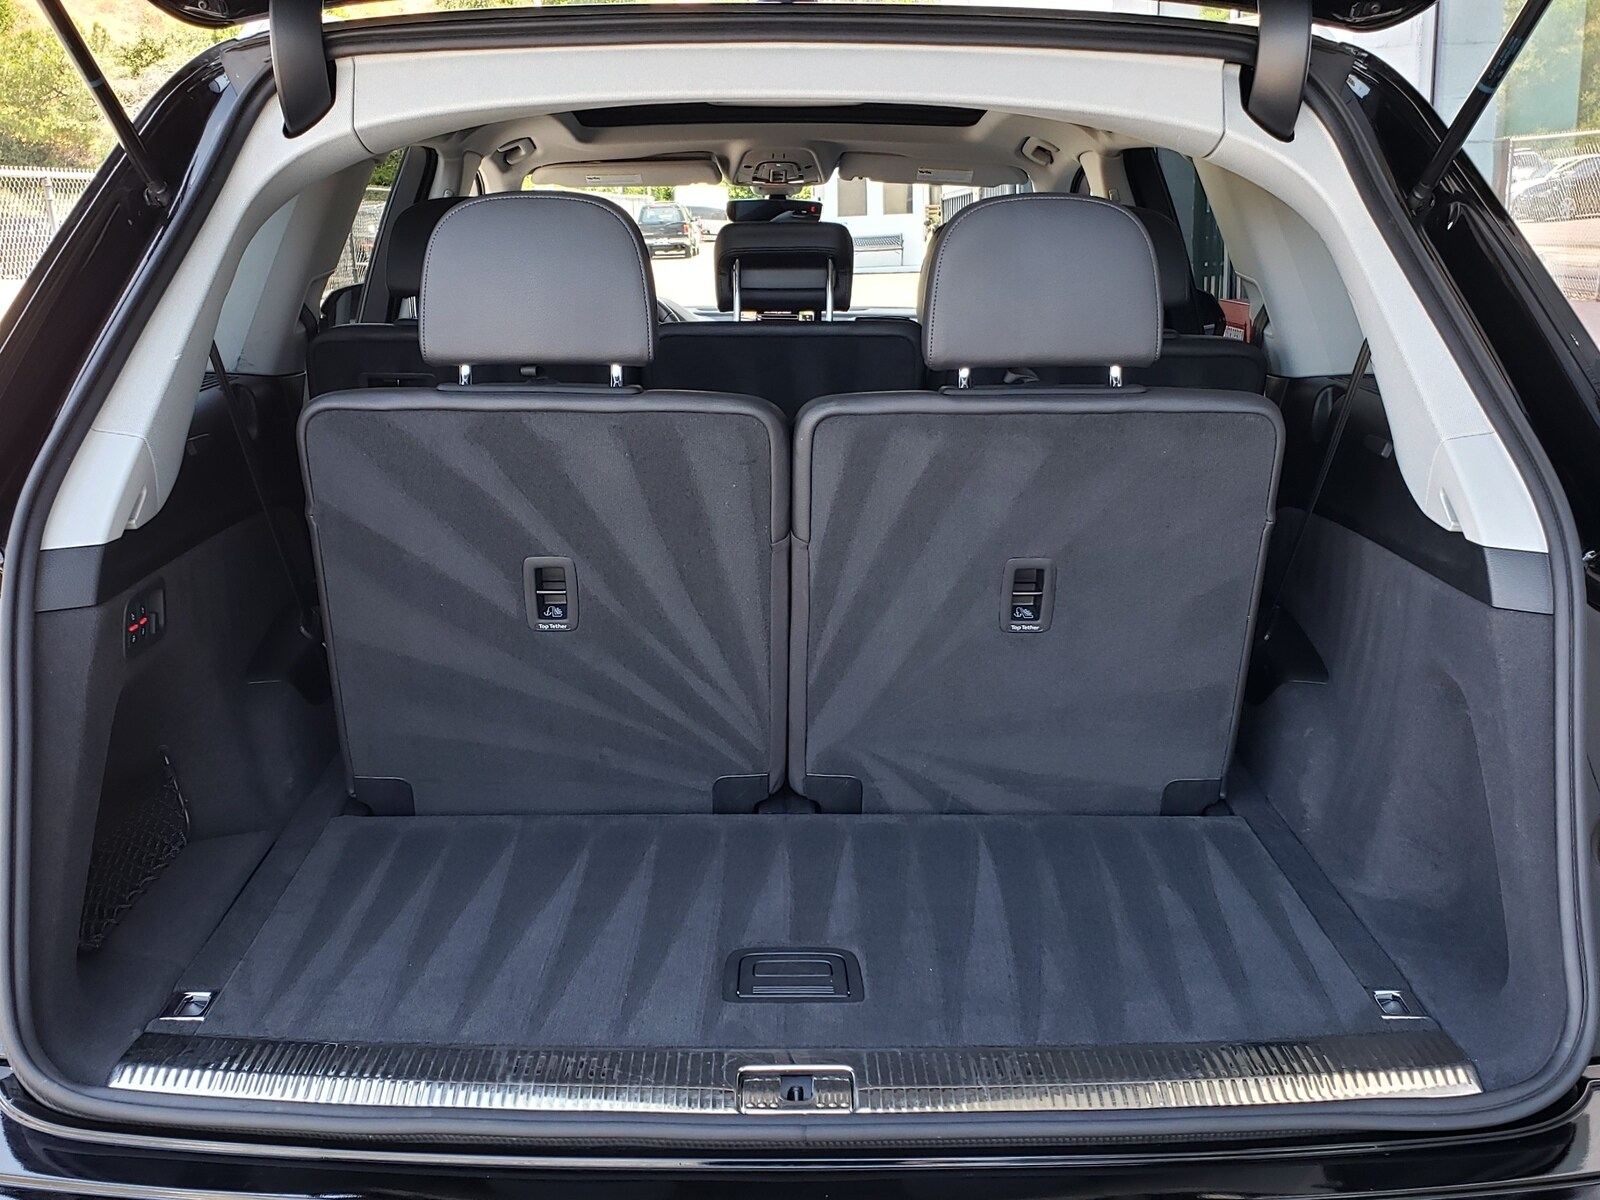 Used 2018 Audi Q7 For Sale at Audi Mission Viejo   VIN